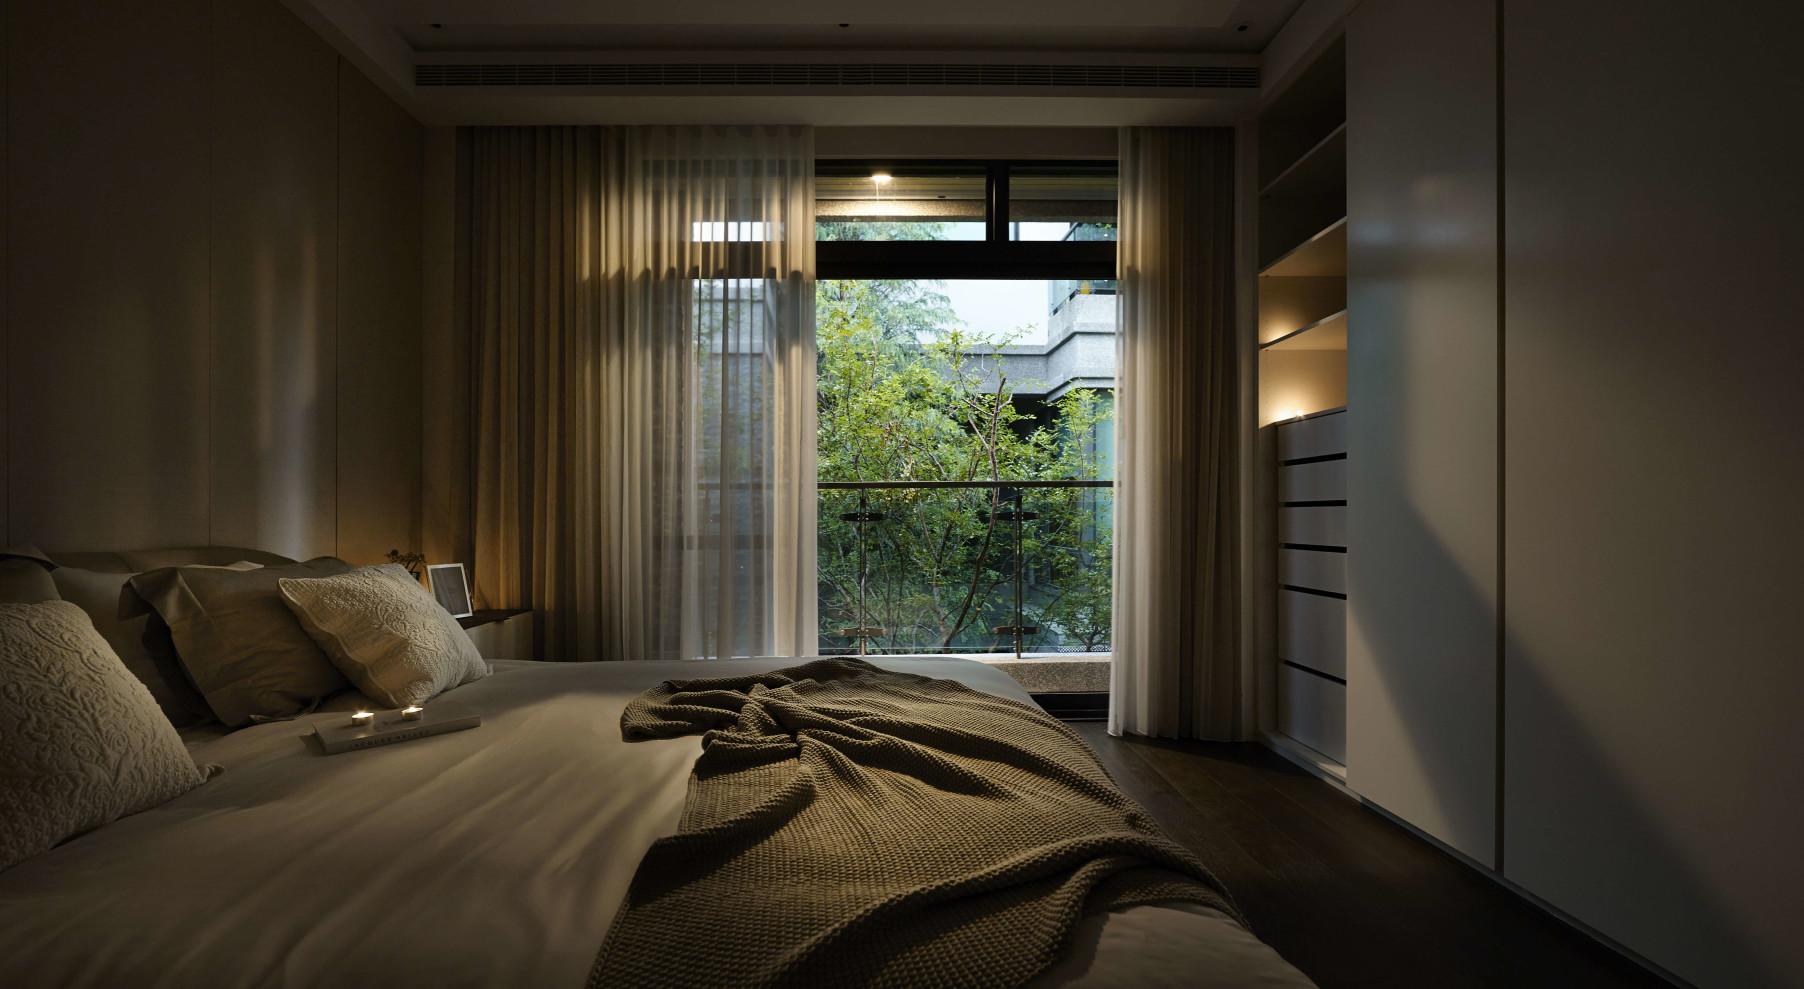 Y House入圍 INSIDE(World Festival of Interiors)世界室內設計節2-分子室內裝修設計公司